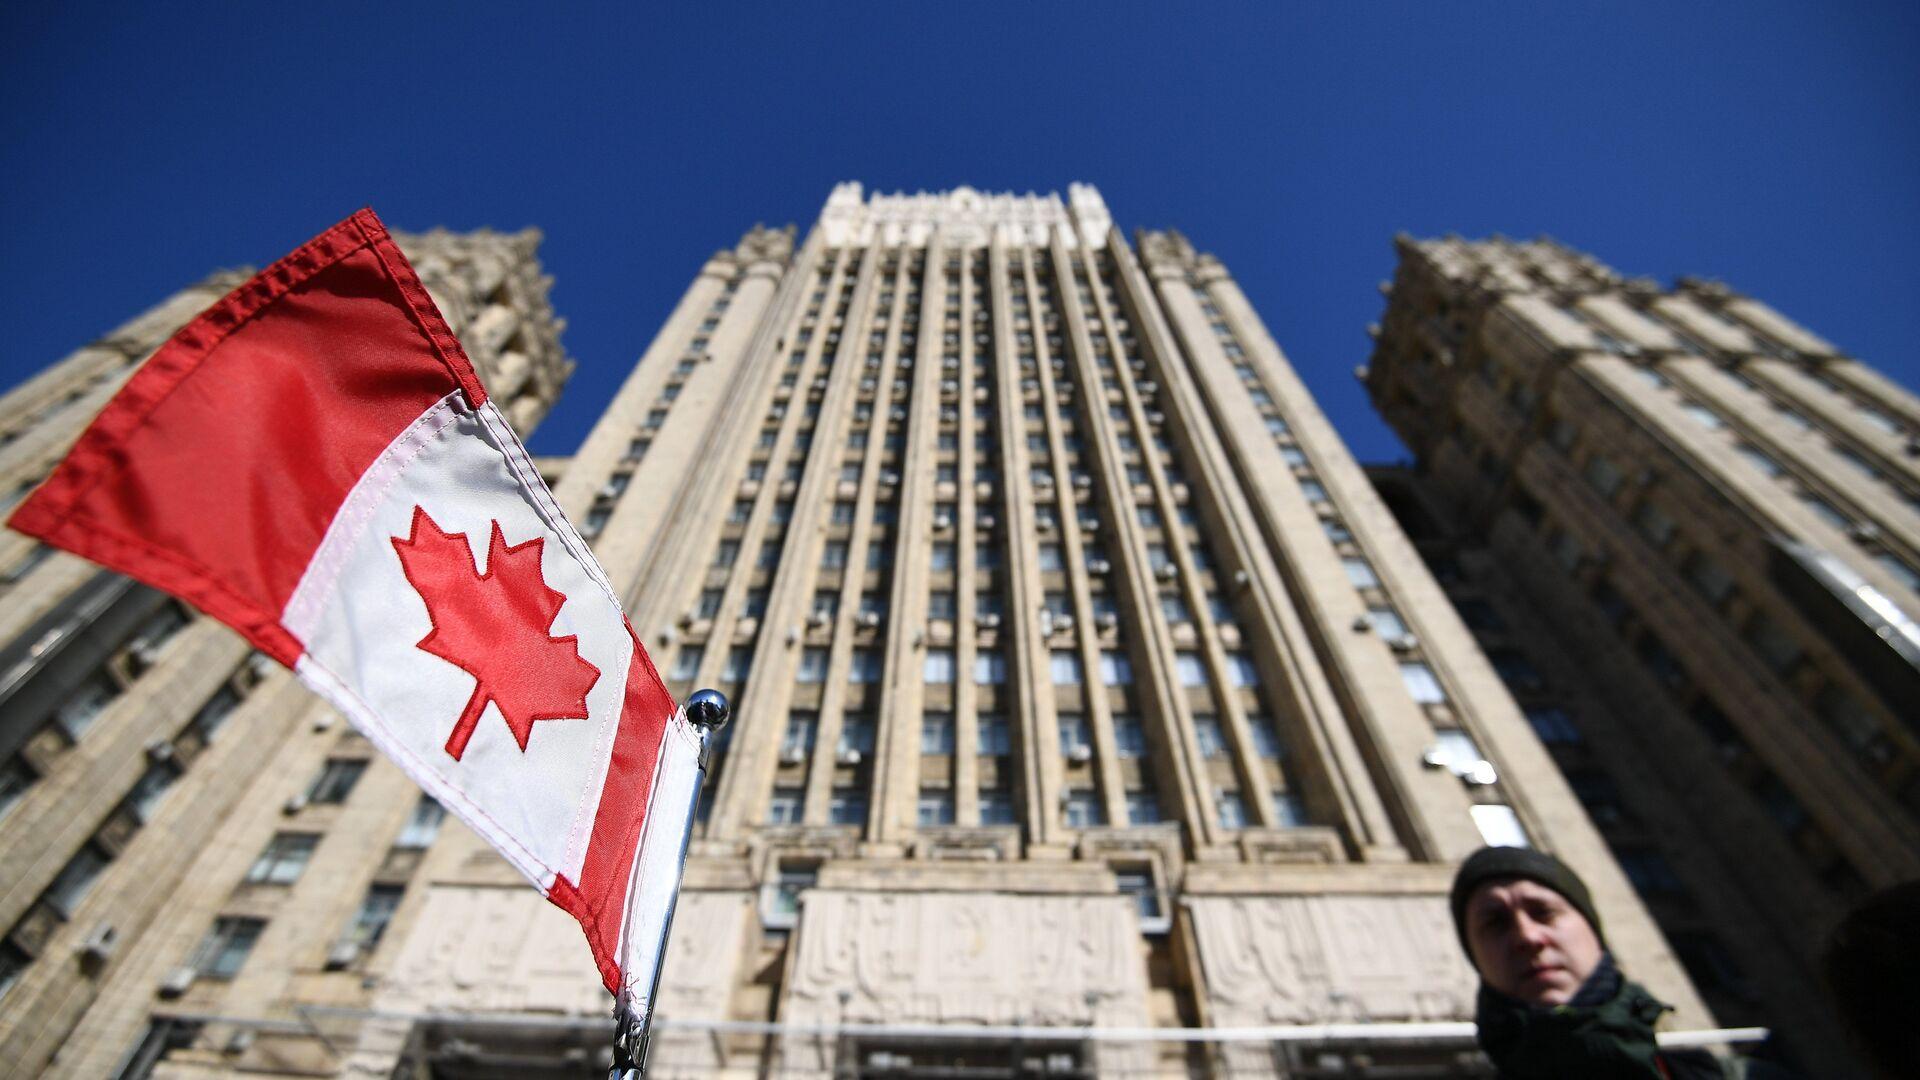 Bandera de Canadá cerca del Ministerio de Asuntos Exteriores de Rusia - Sputnik Mundo, 1920, 25.03.2021